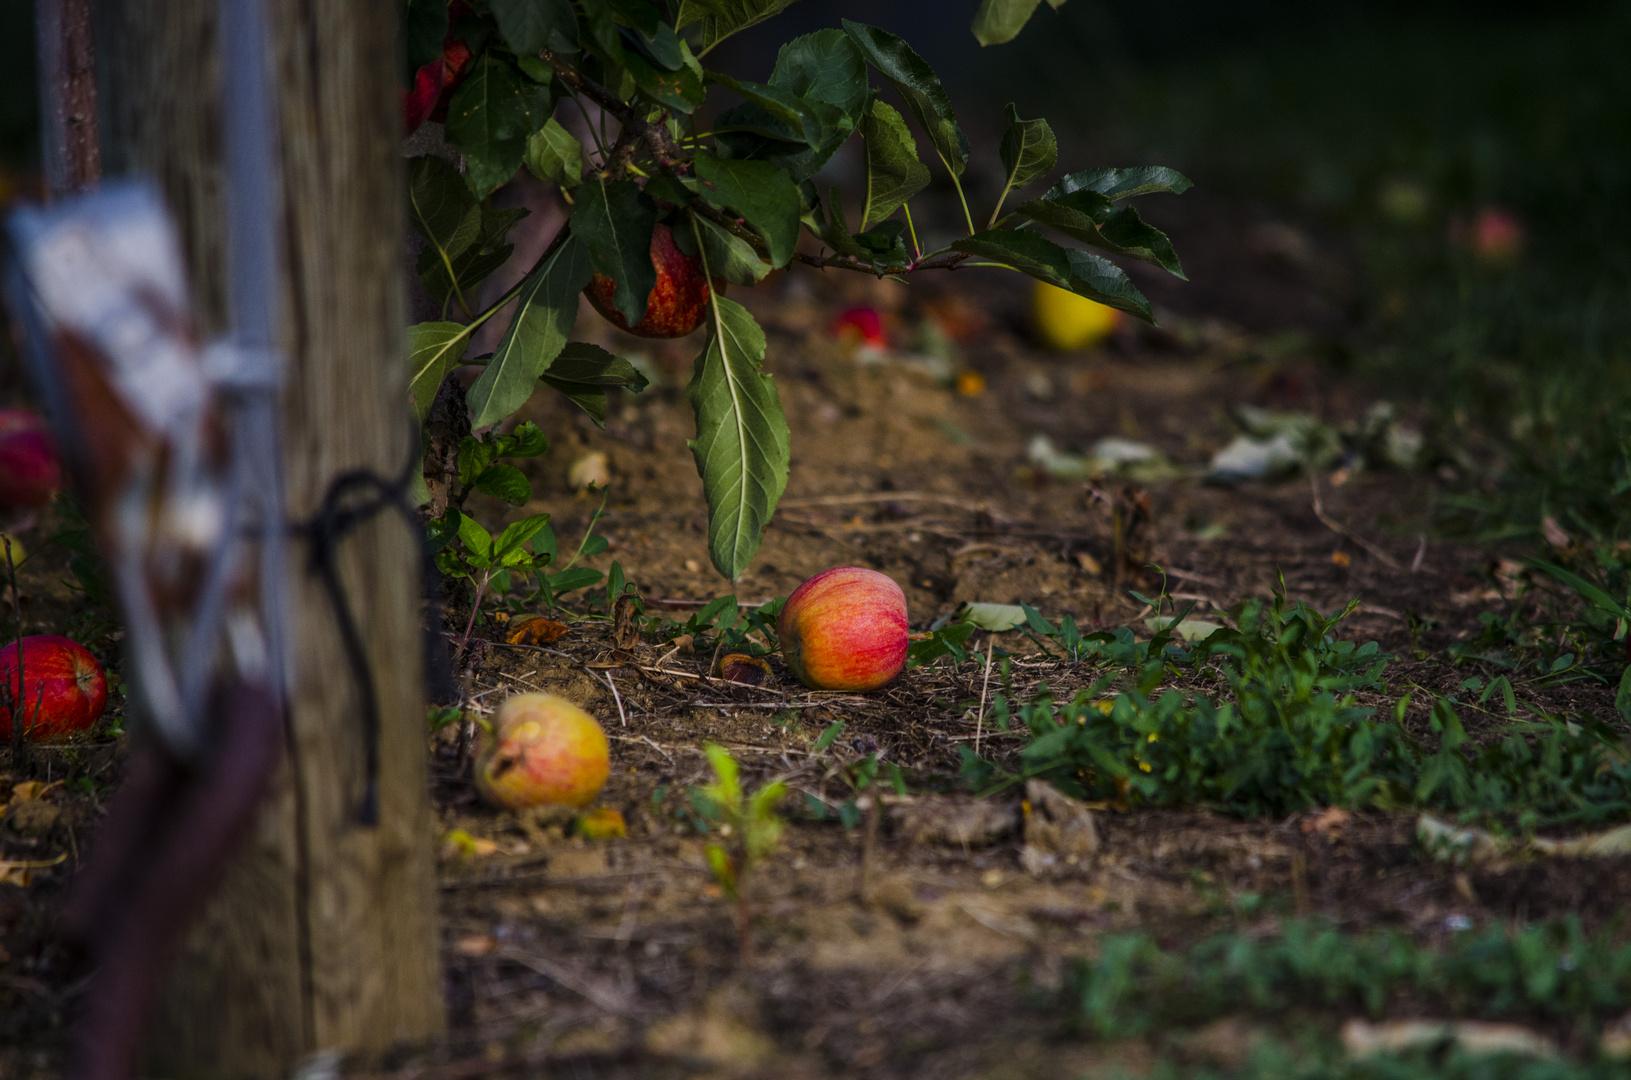 Apfel am Boden